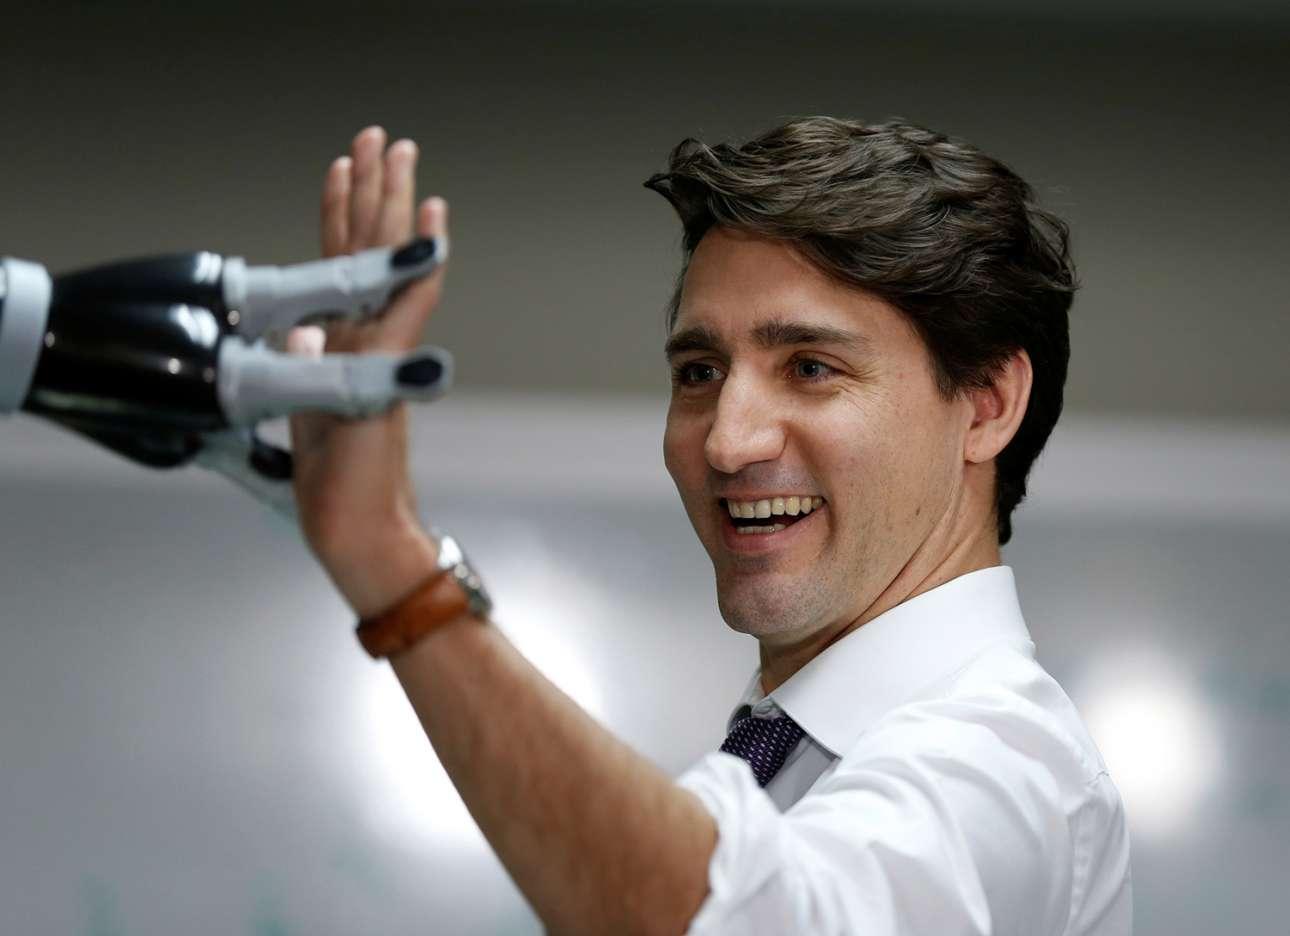 High five! Ο πρωθυπουργός του Καναδά, Τζάστιν Τριντό χαιρετά ένα ρομπότ